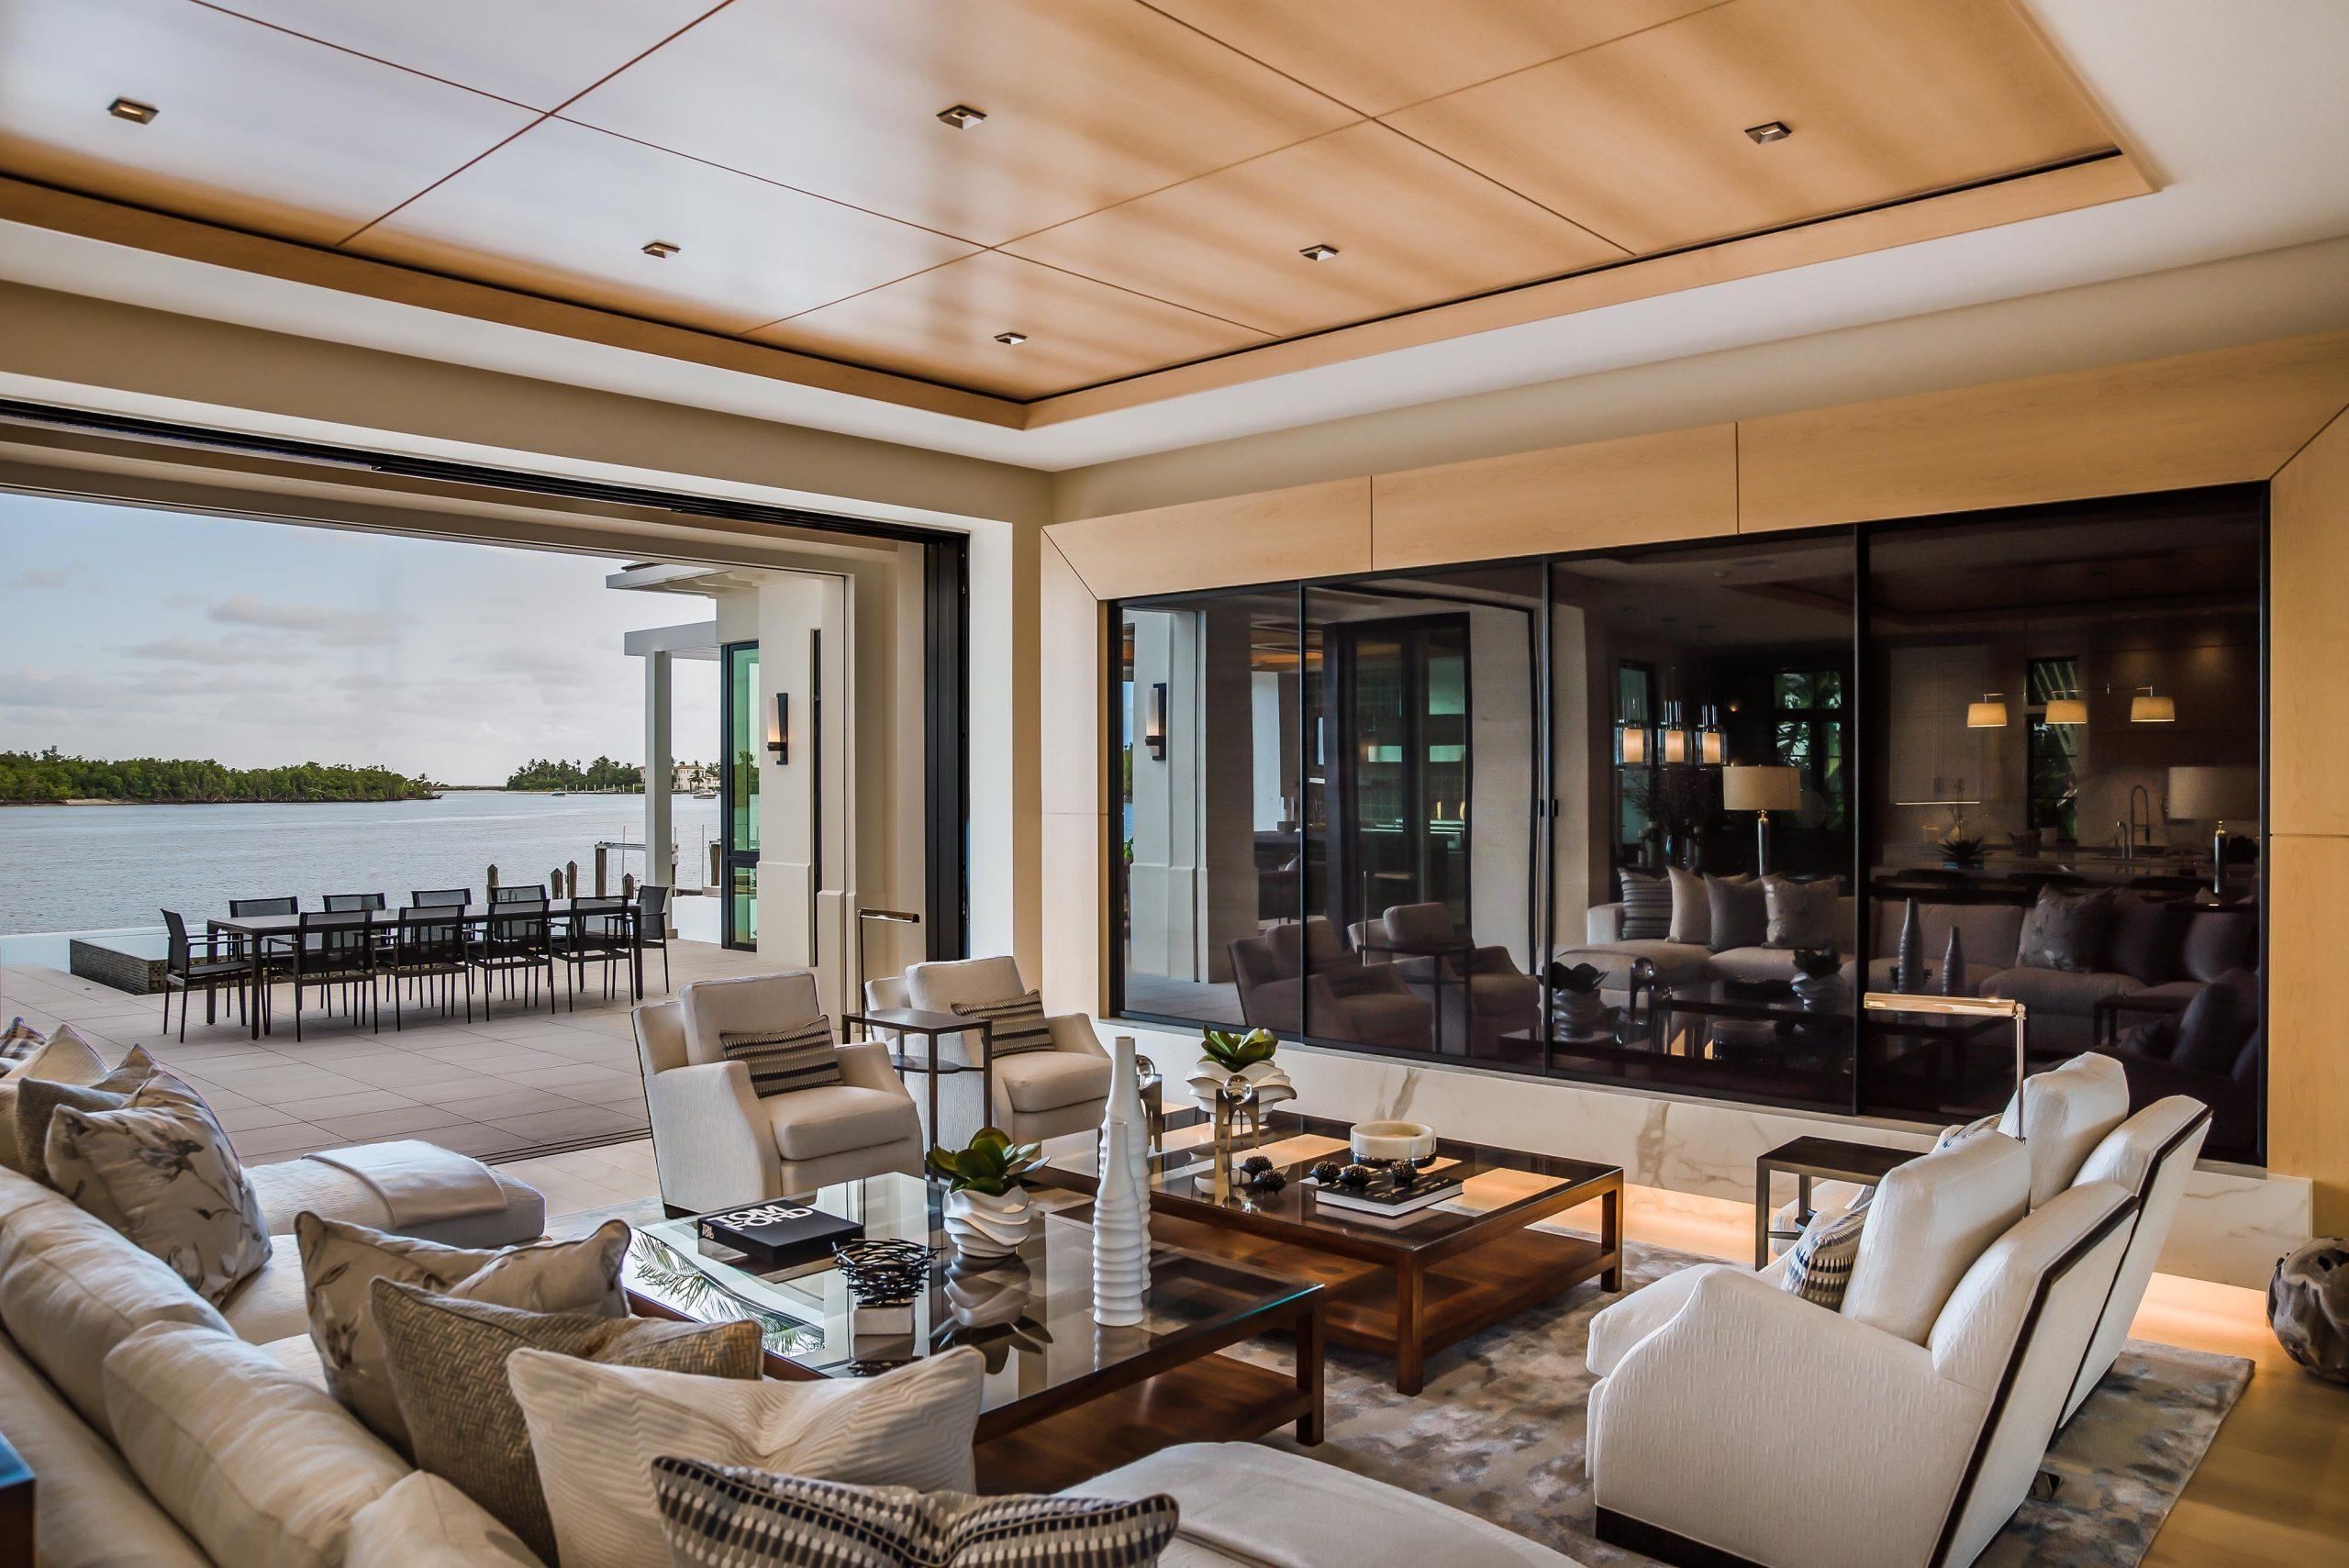 Distinctive Features of Residential Interior Design